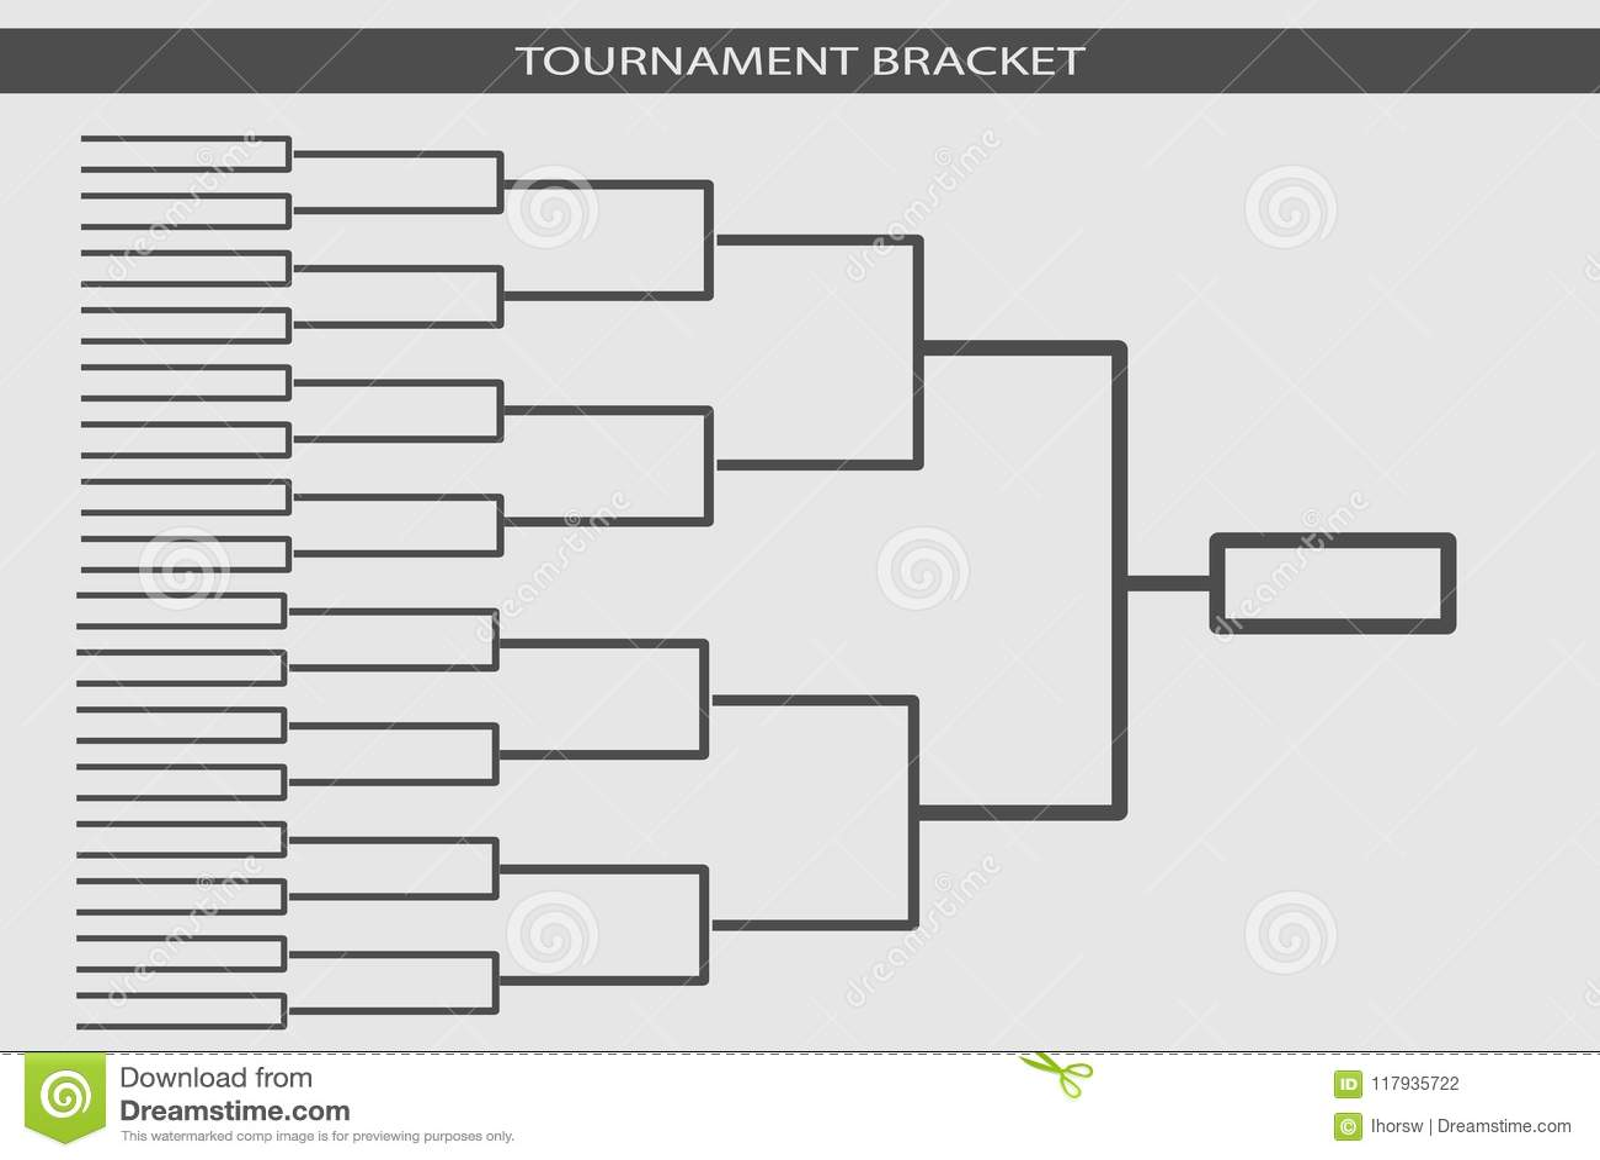 Tournament Bracket Vector Championship Template Stock Vector